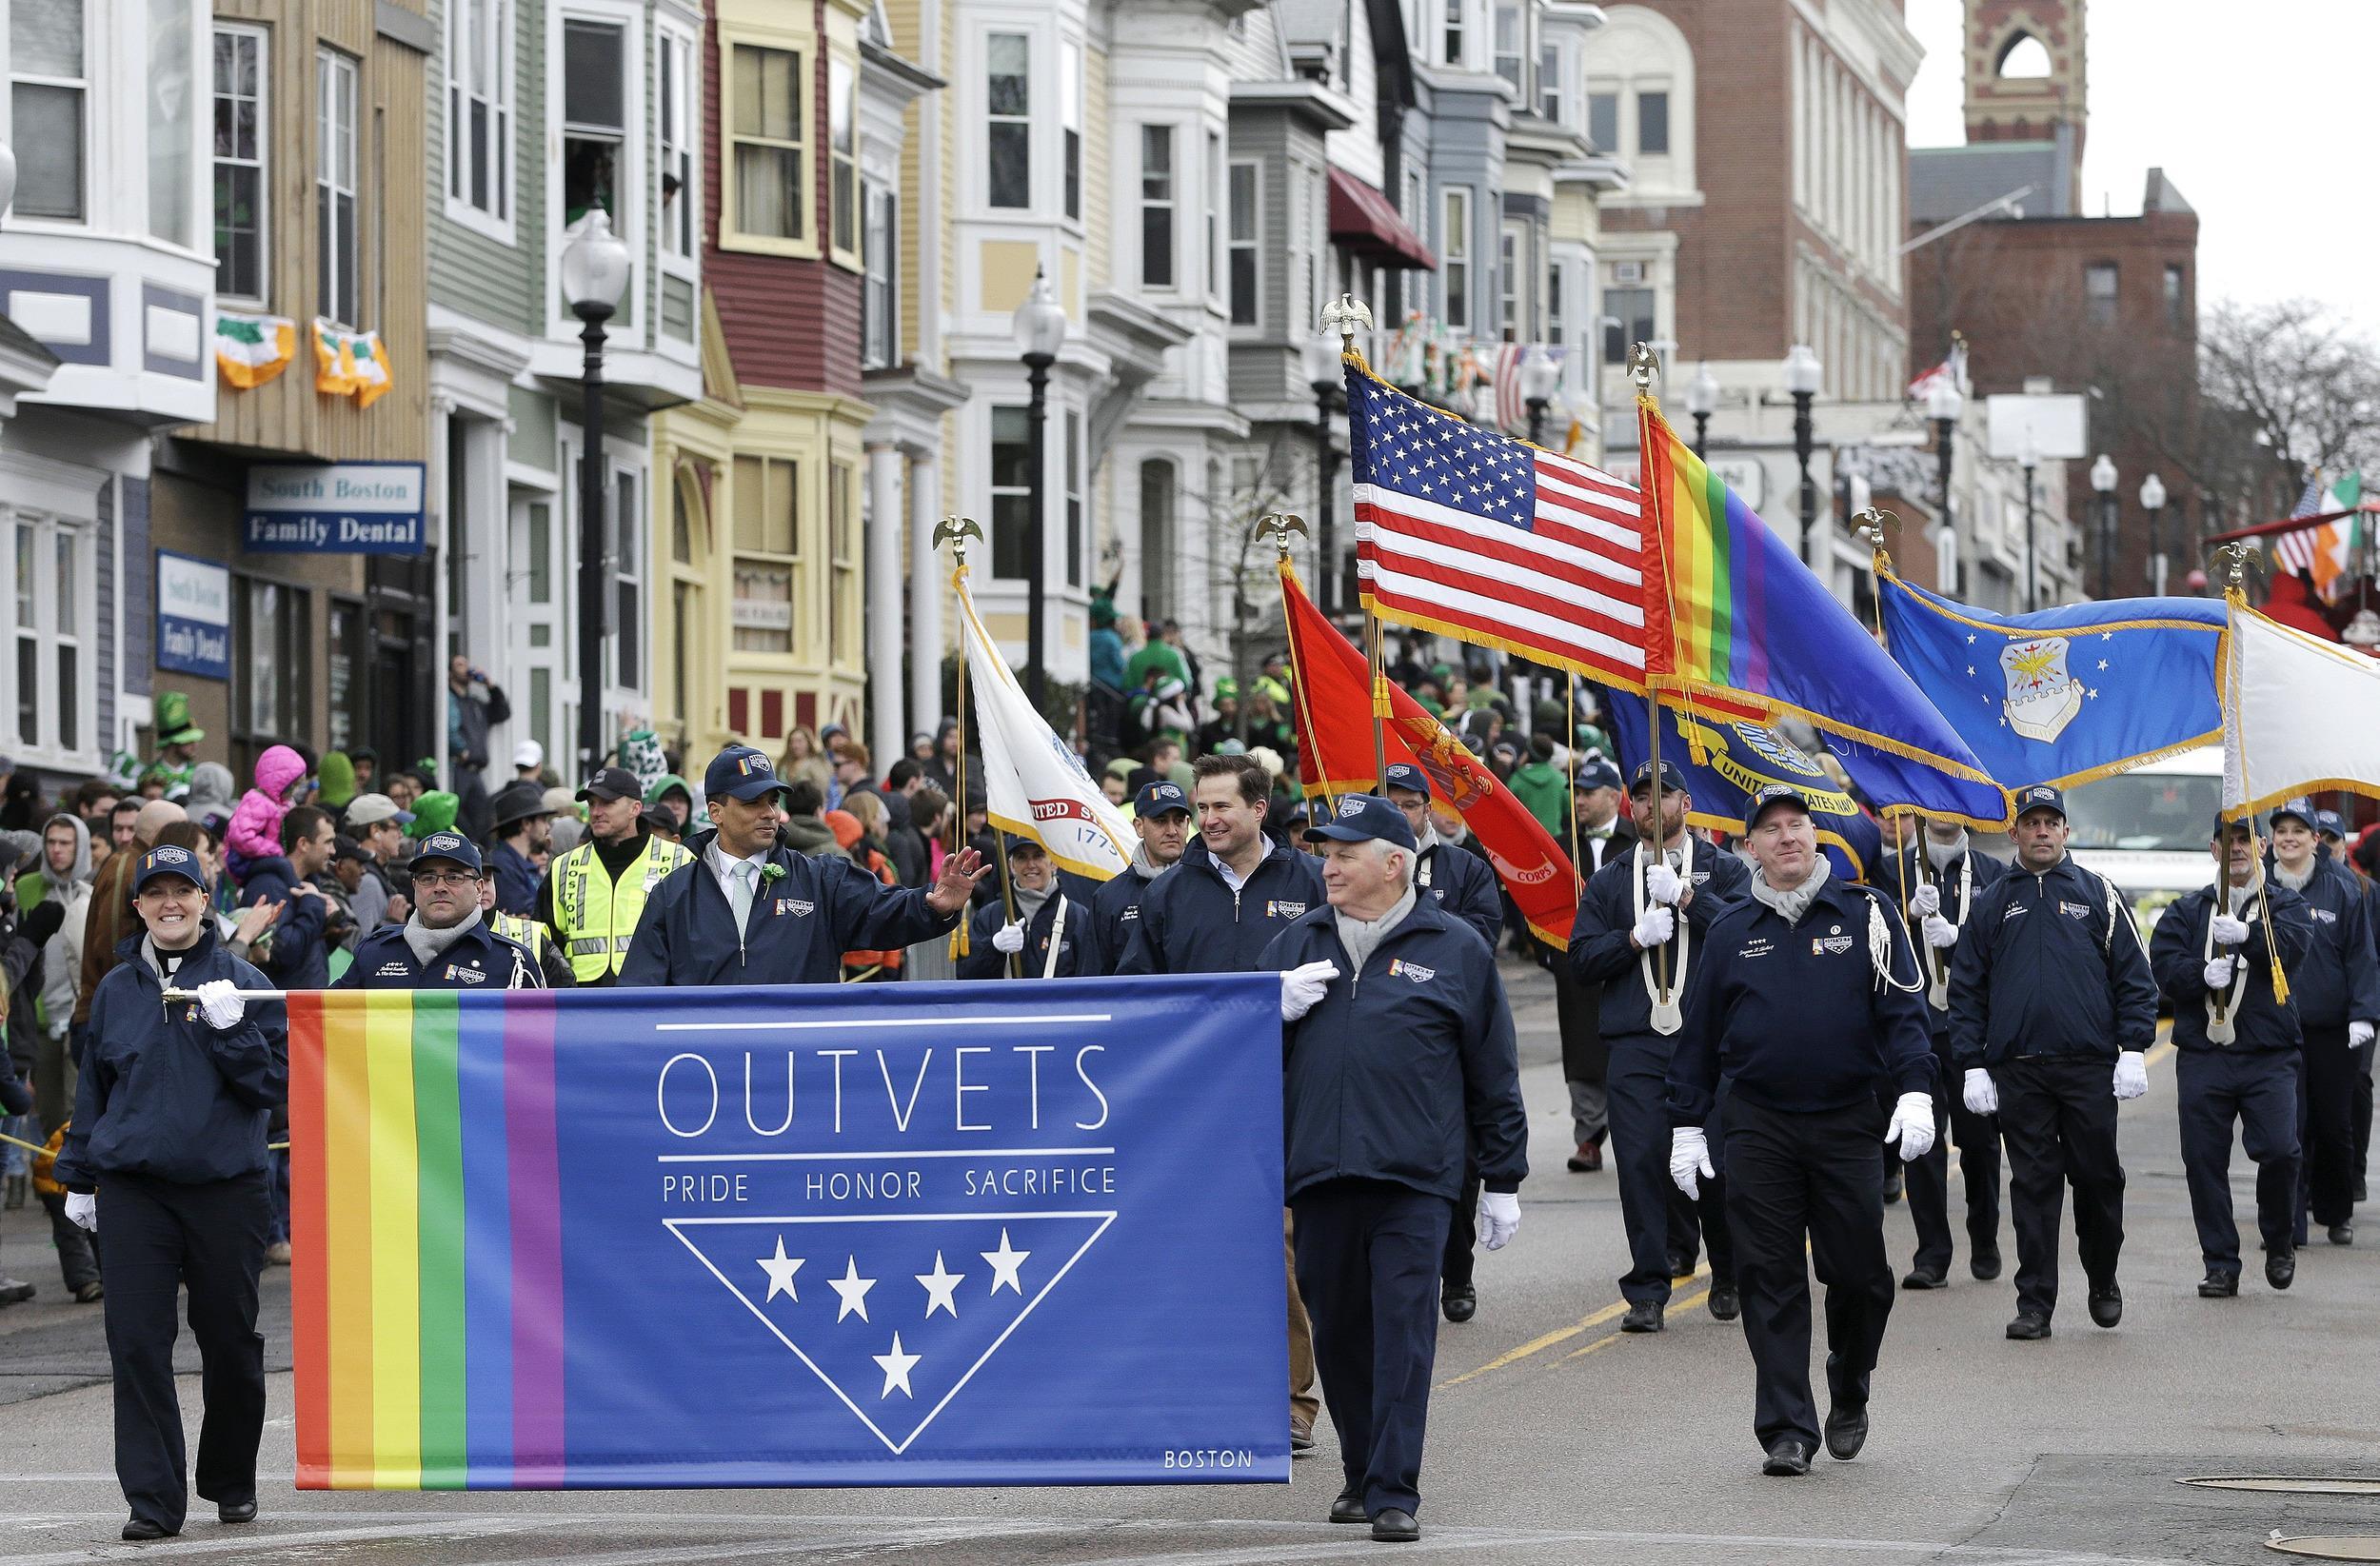 01-Gays-in-boston